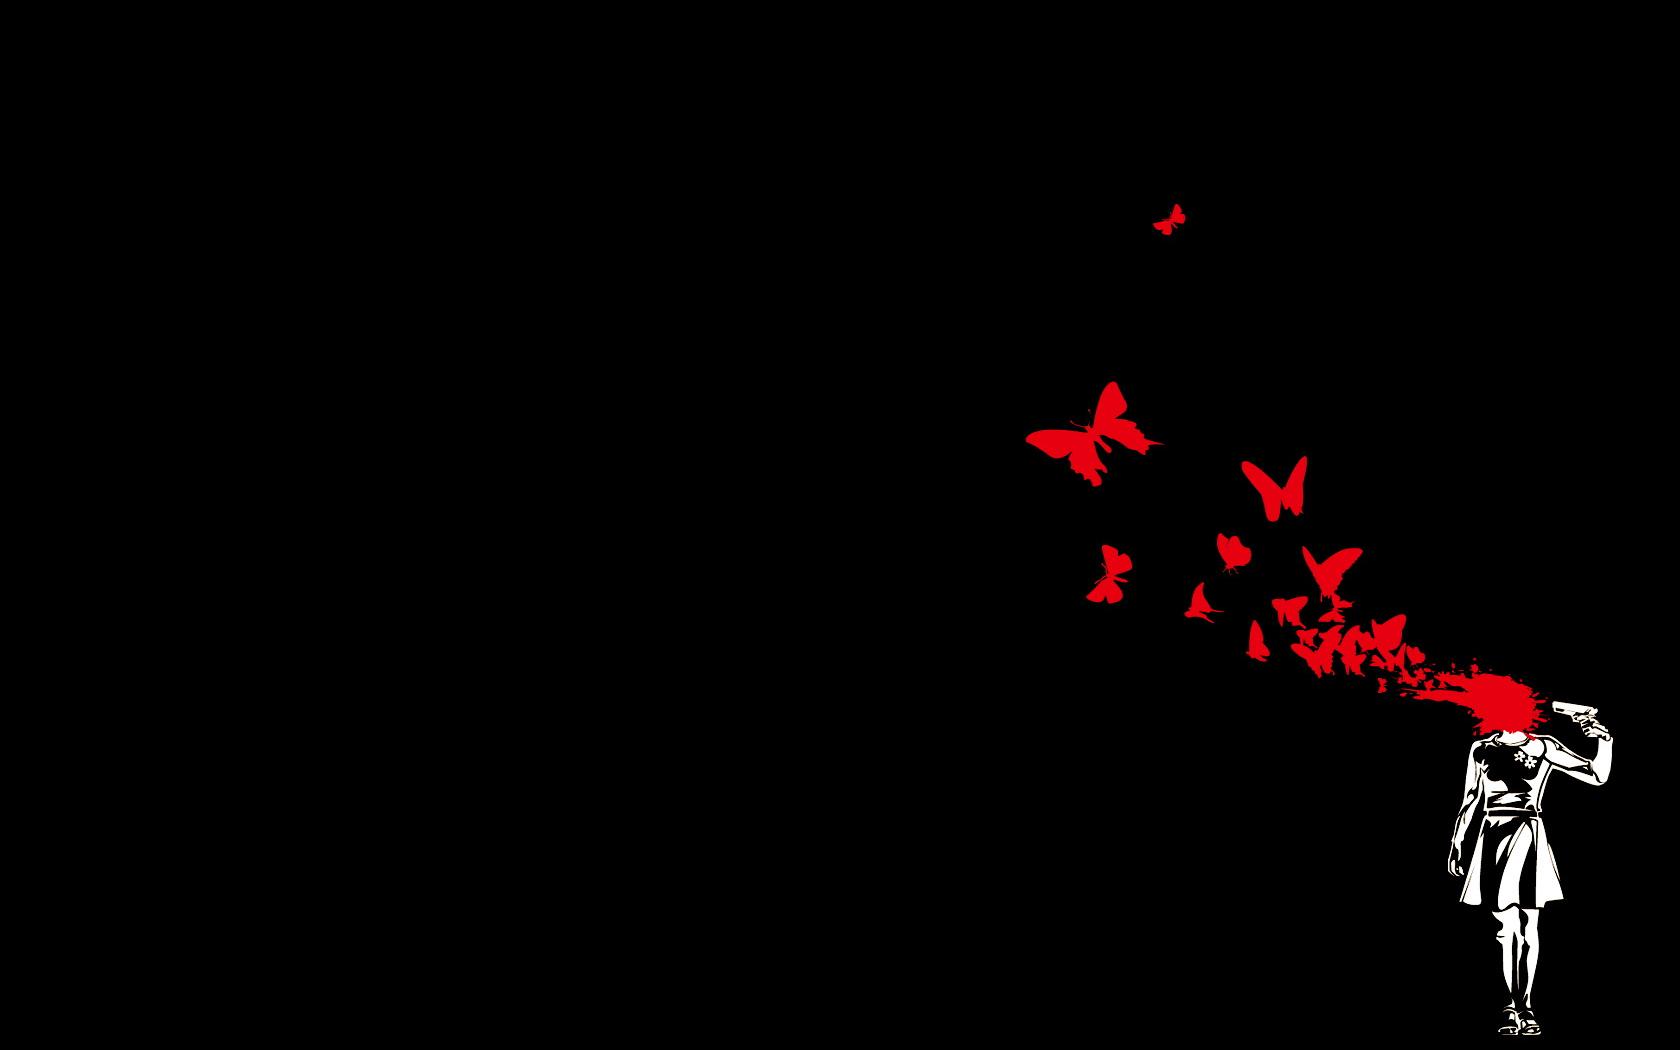 66+ Red Butterfly Wallpaper on WallpaperSafari